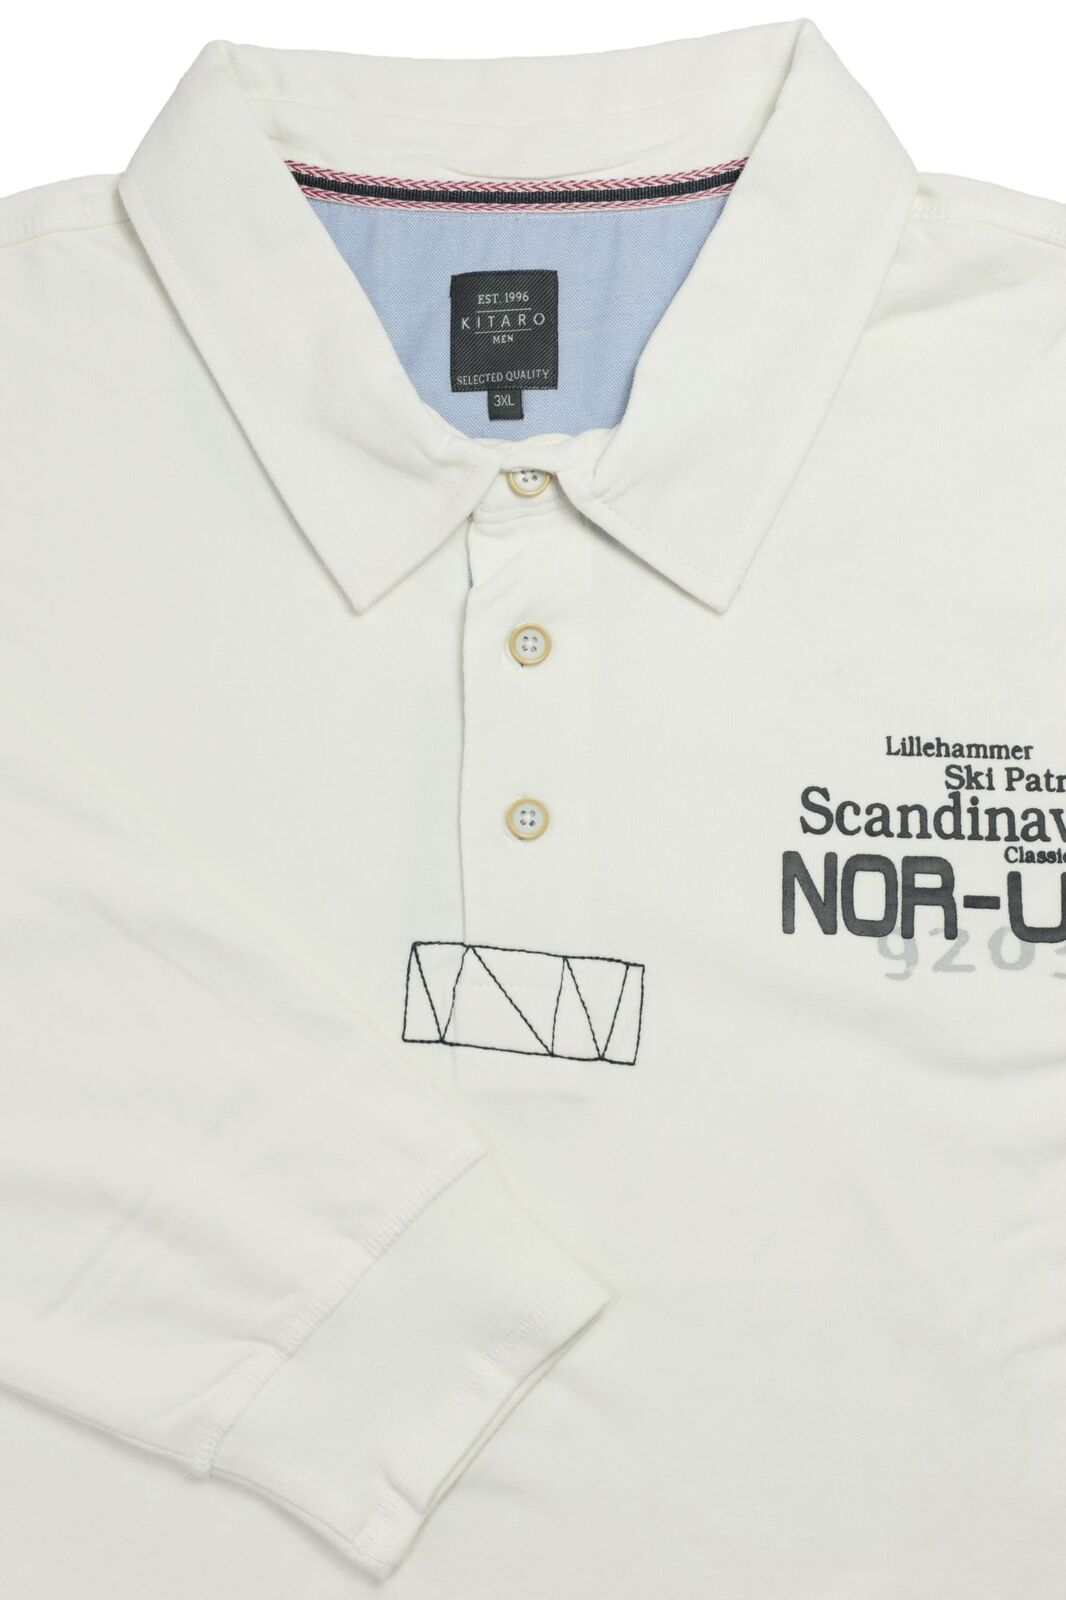 Kitaro Polosweat Sweatshirt Polo Sweat Shirt Herren Langarm Plusgröße Plusgröße Plusgröße Übergröße  | Speichern  6e6fde